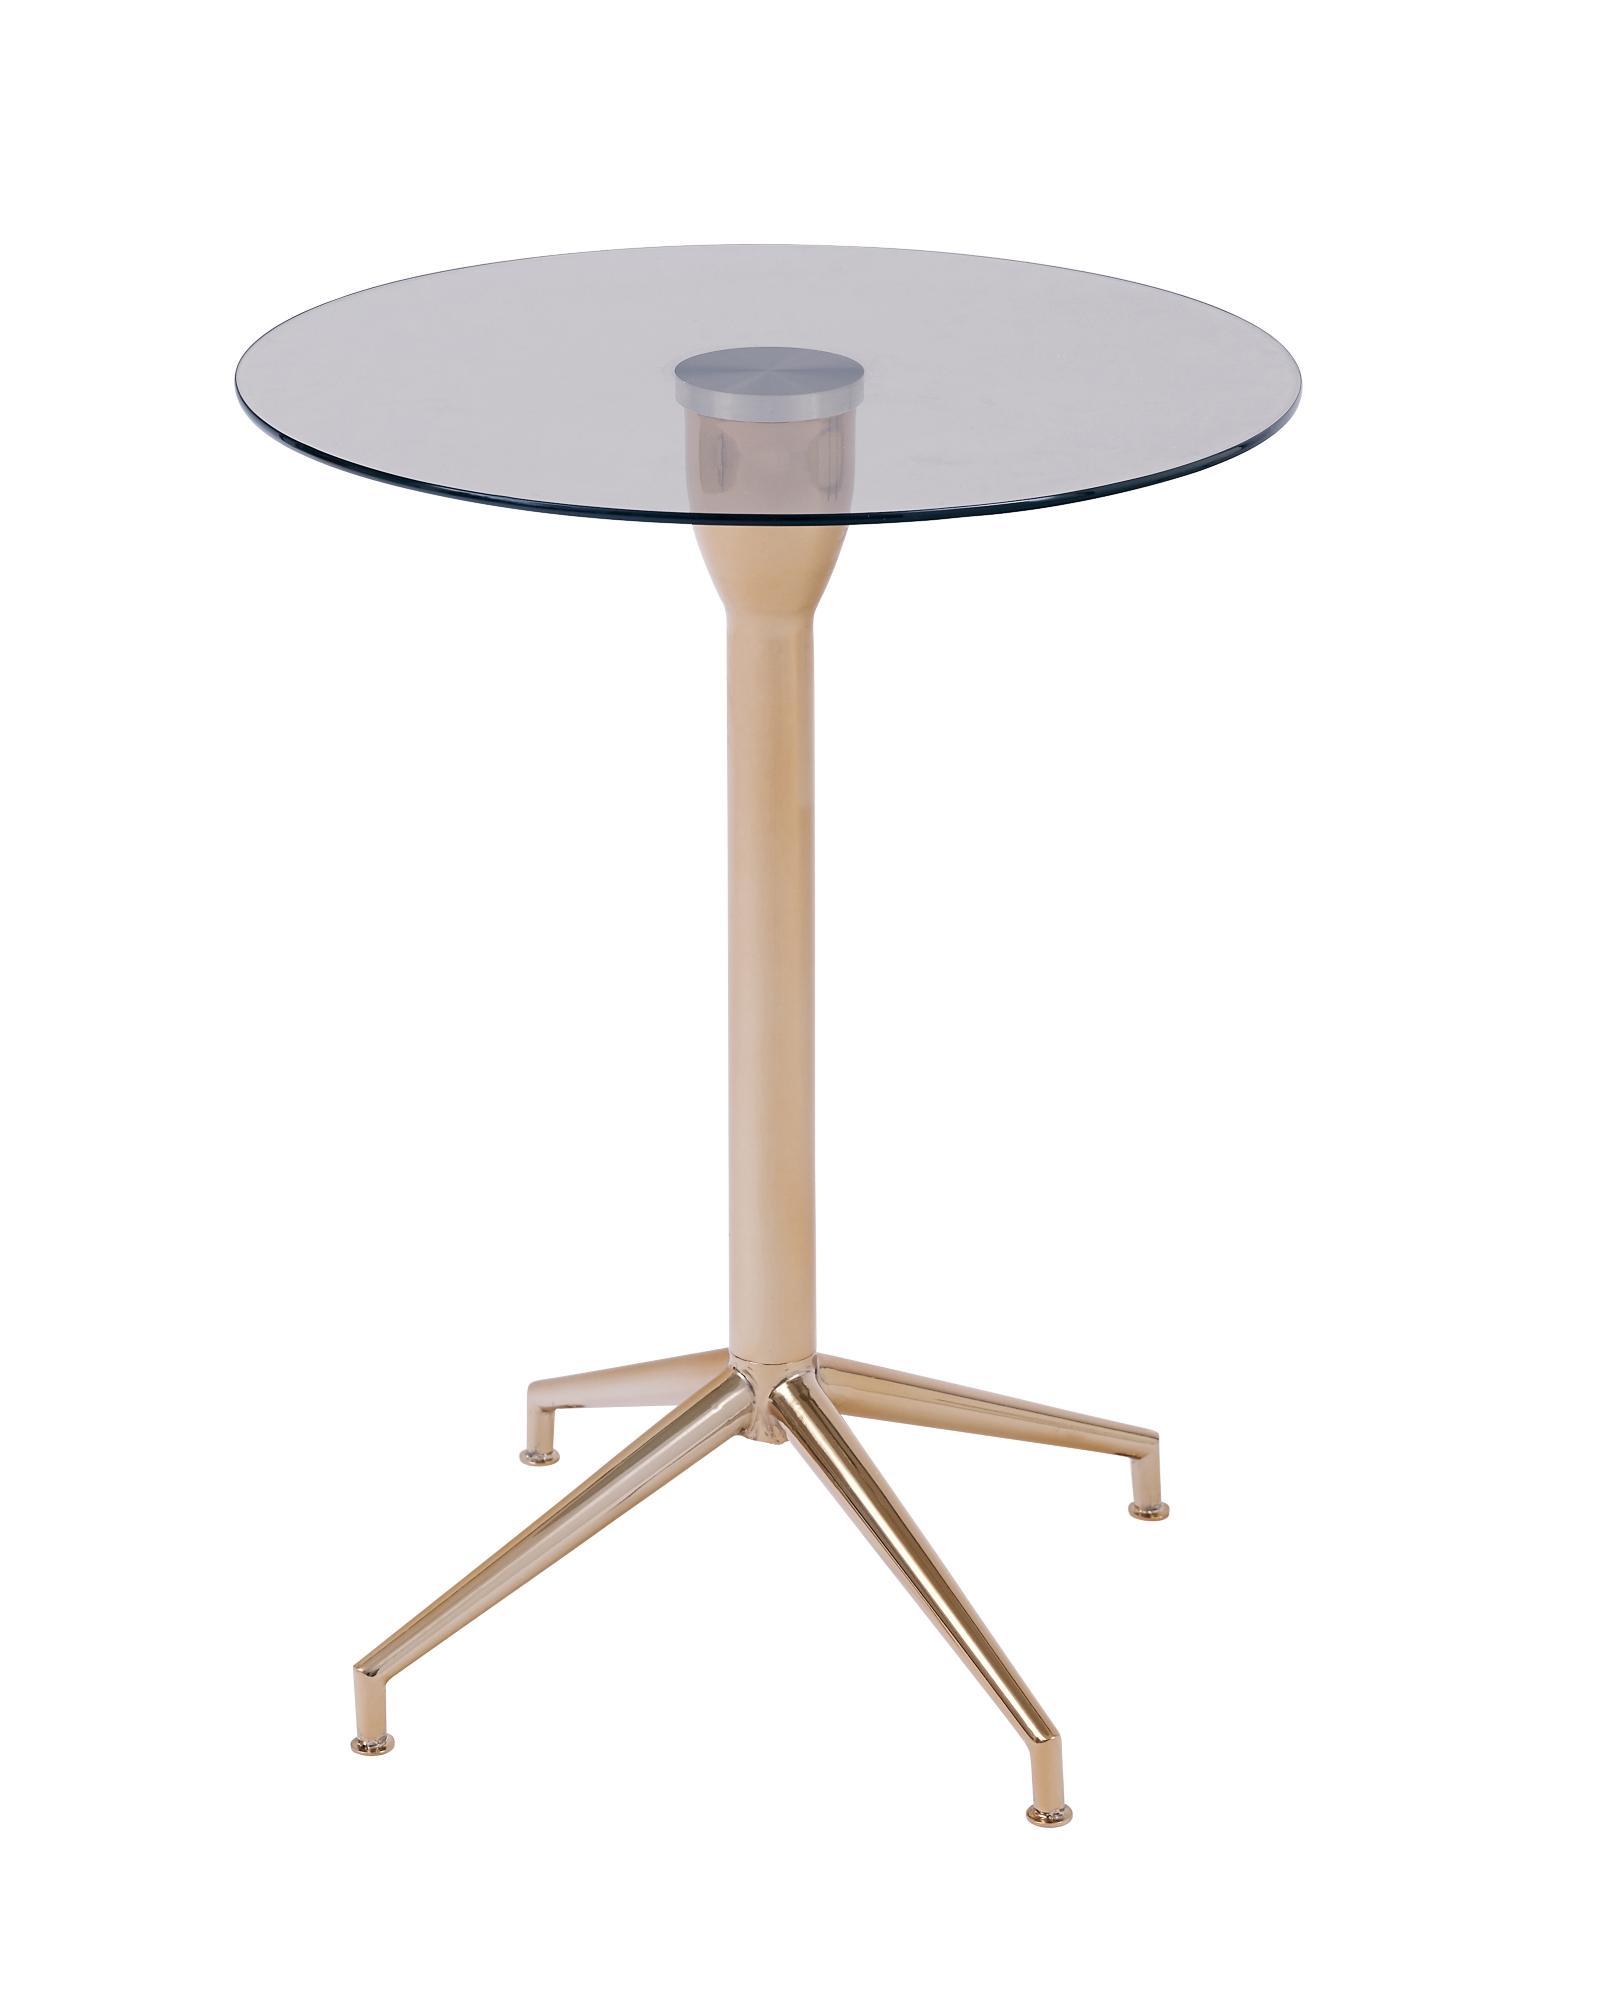 Salduba Rose Gold Tempered Glass Side Table